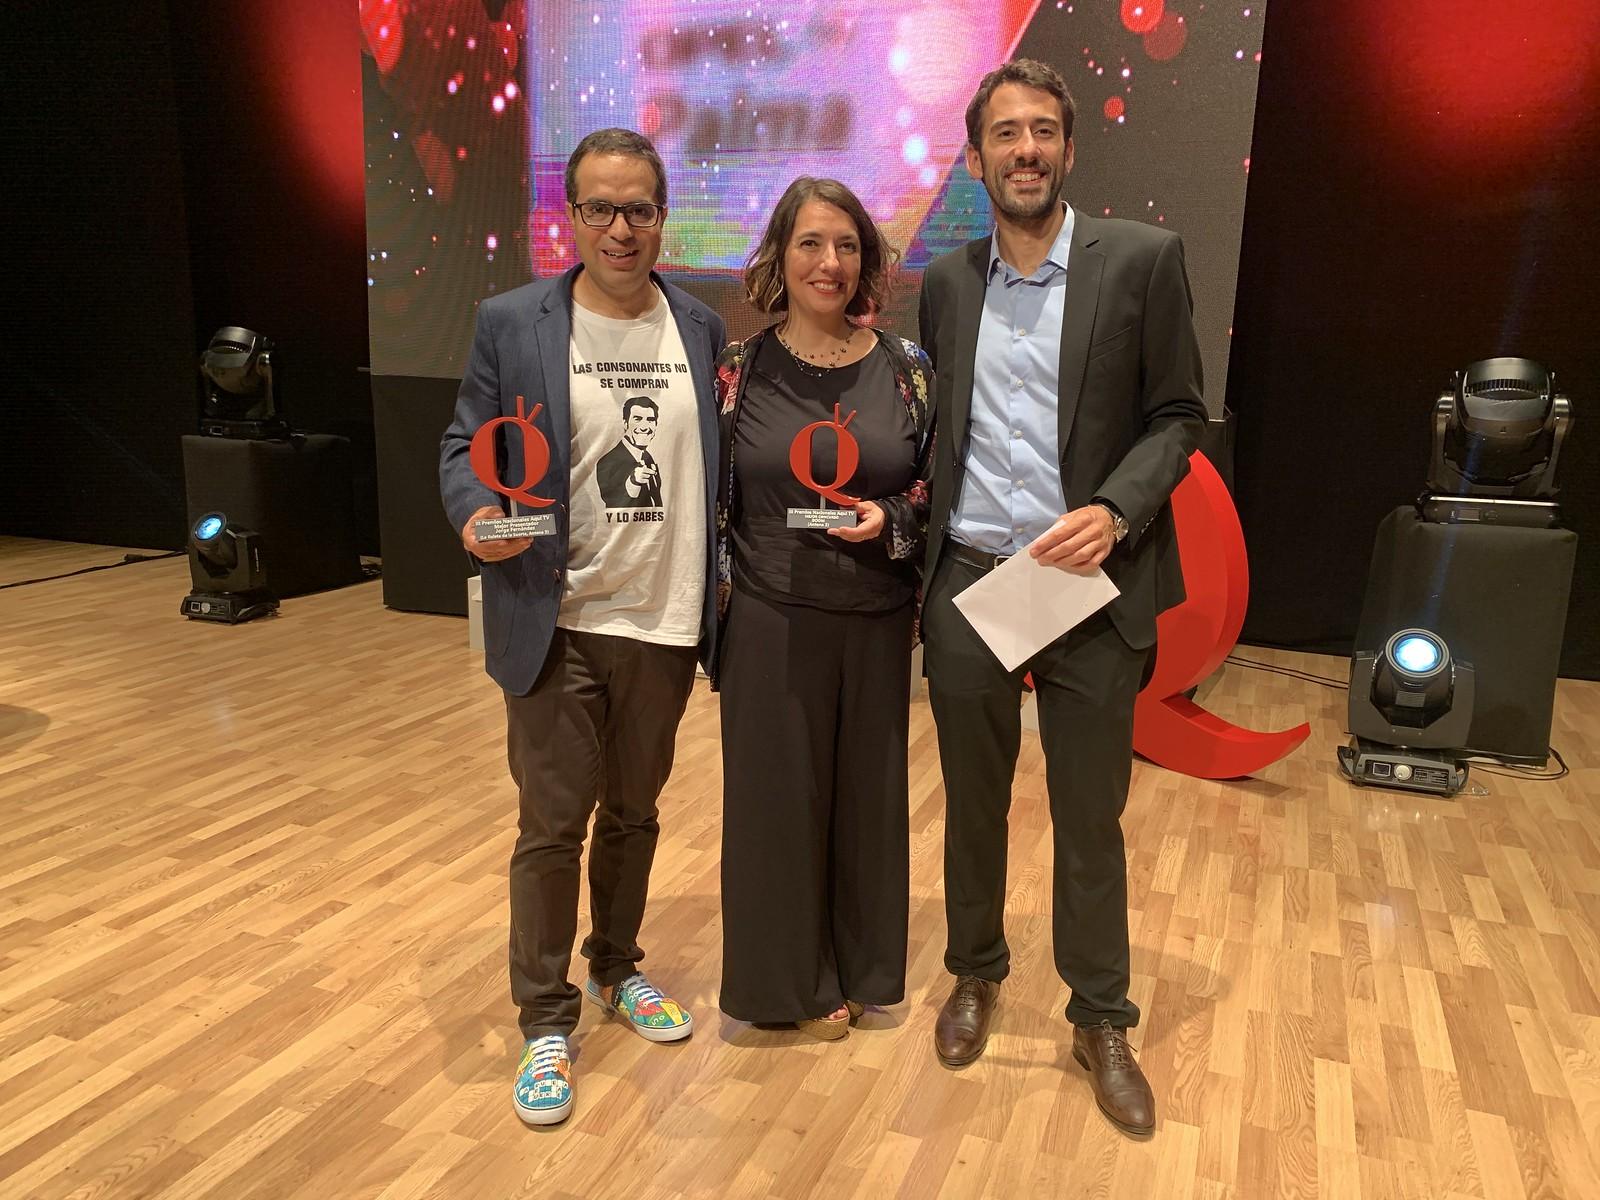 Concursos de Antena 3